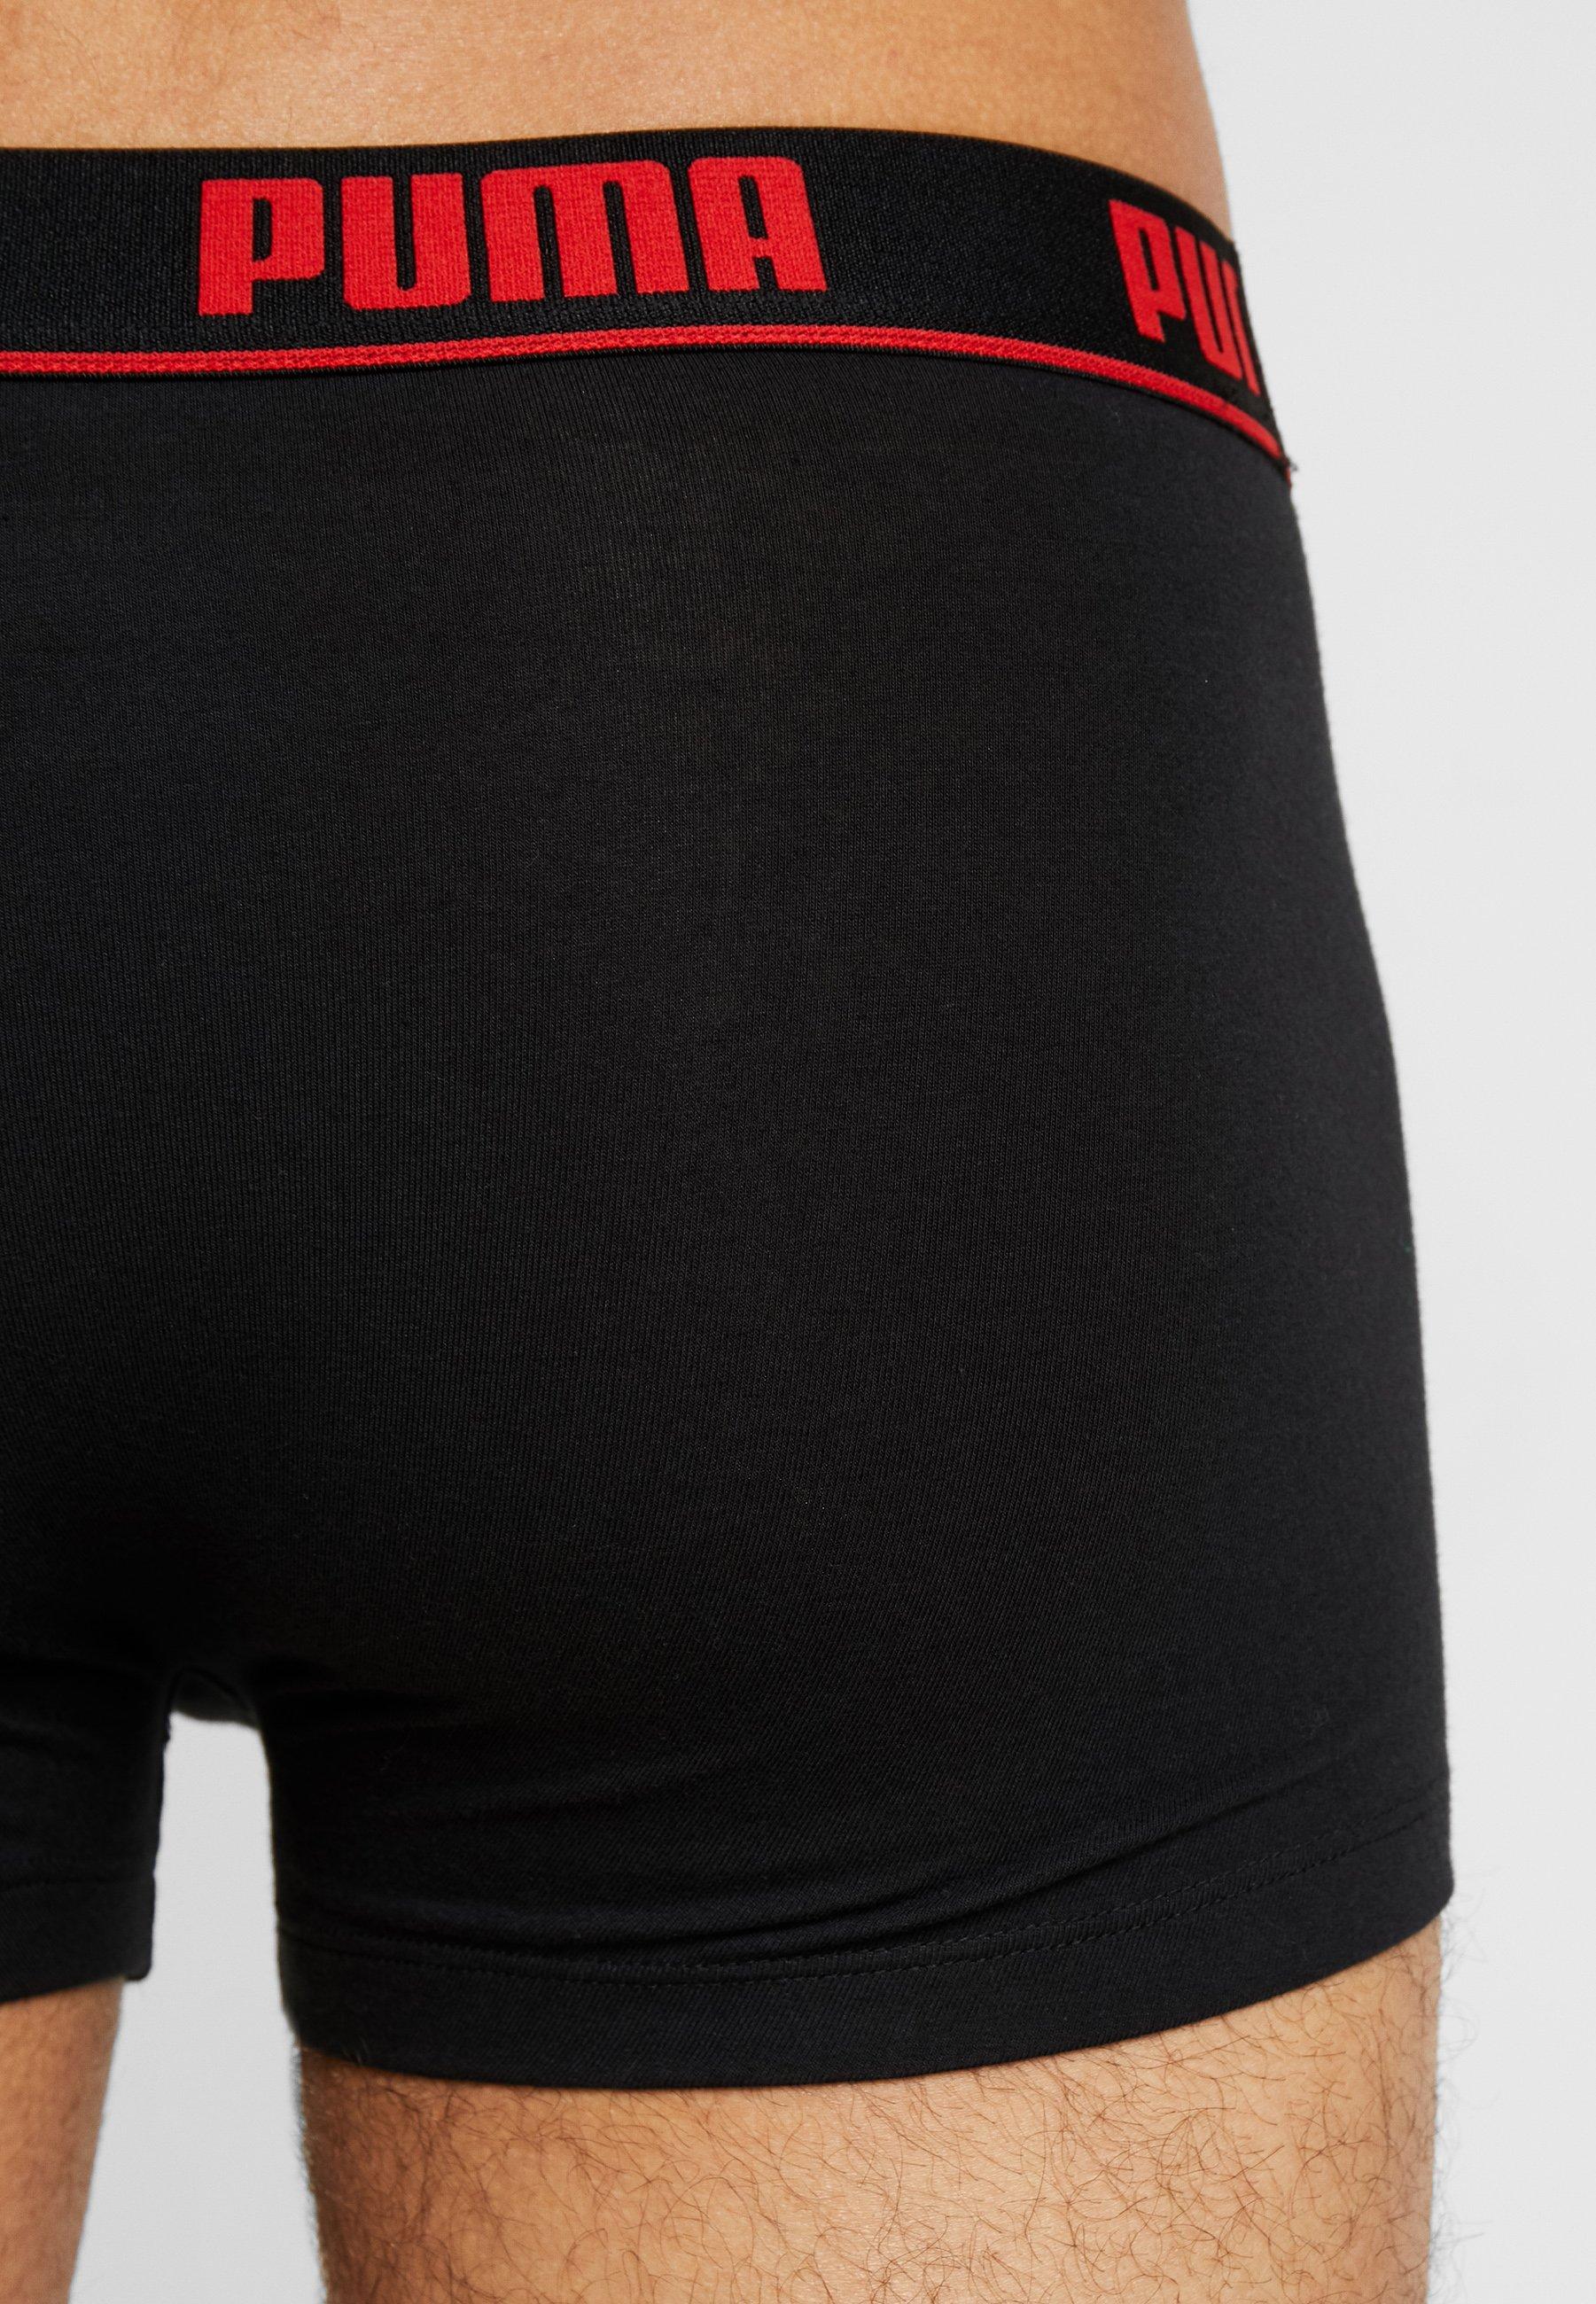 Puma Basic PackShorty Red Shortboxer black 2 mN8wvn0